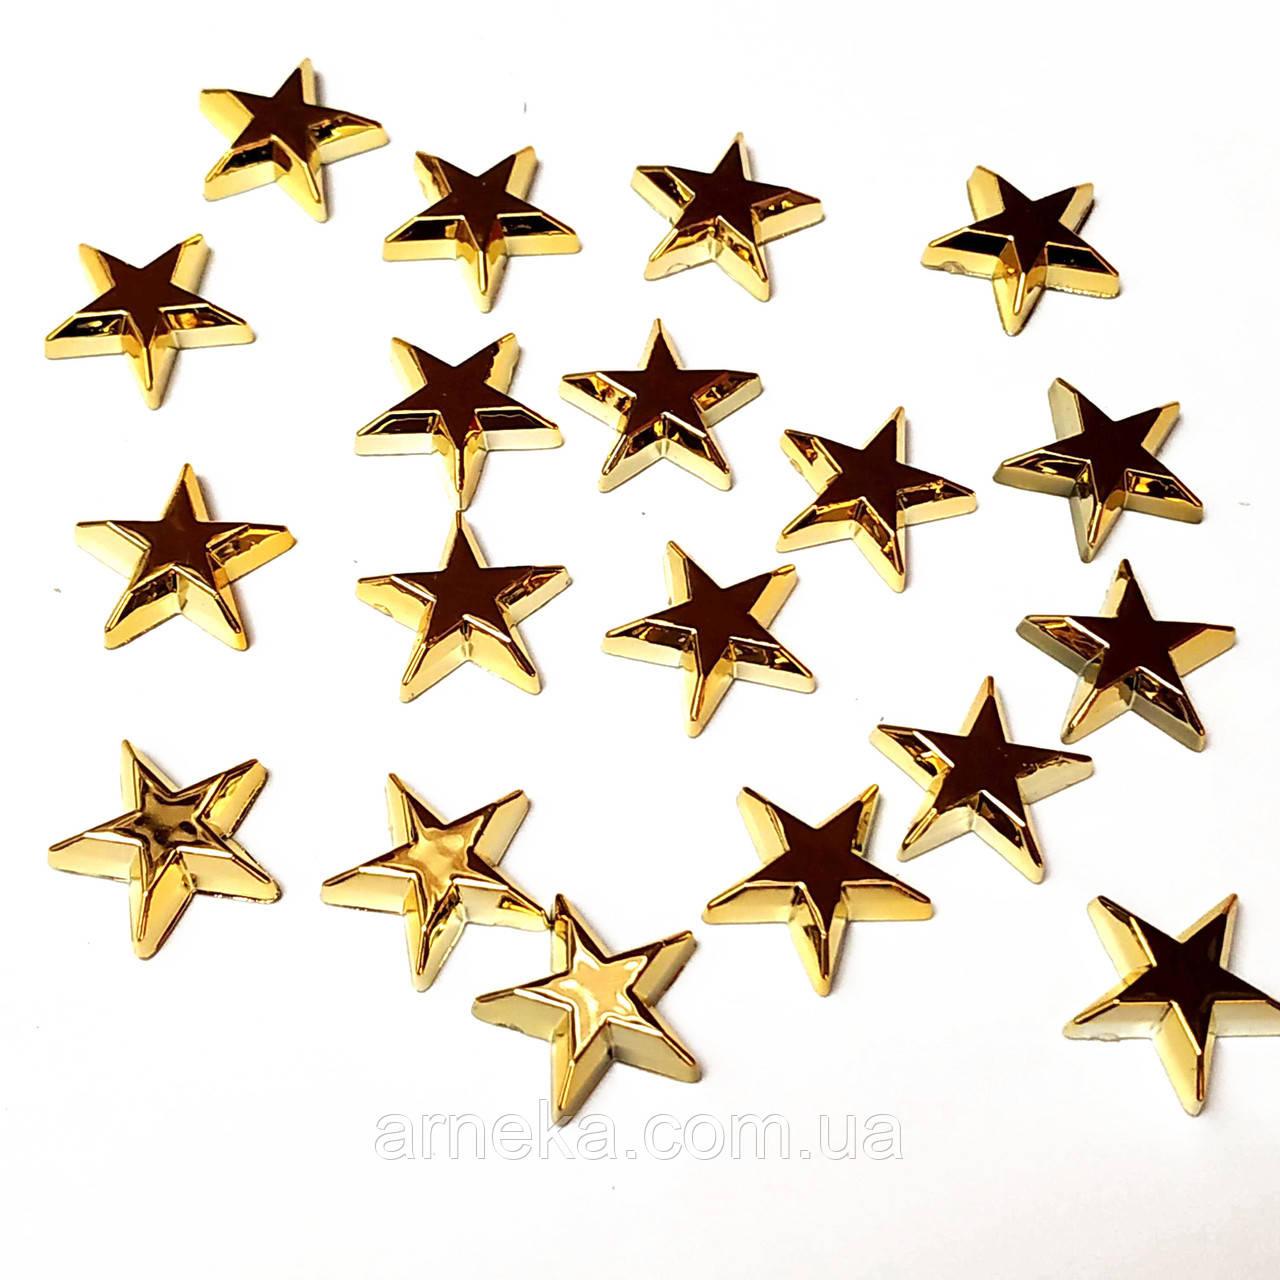 Серединка, кабошон звездочка под золото, 14 мм